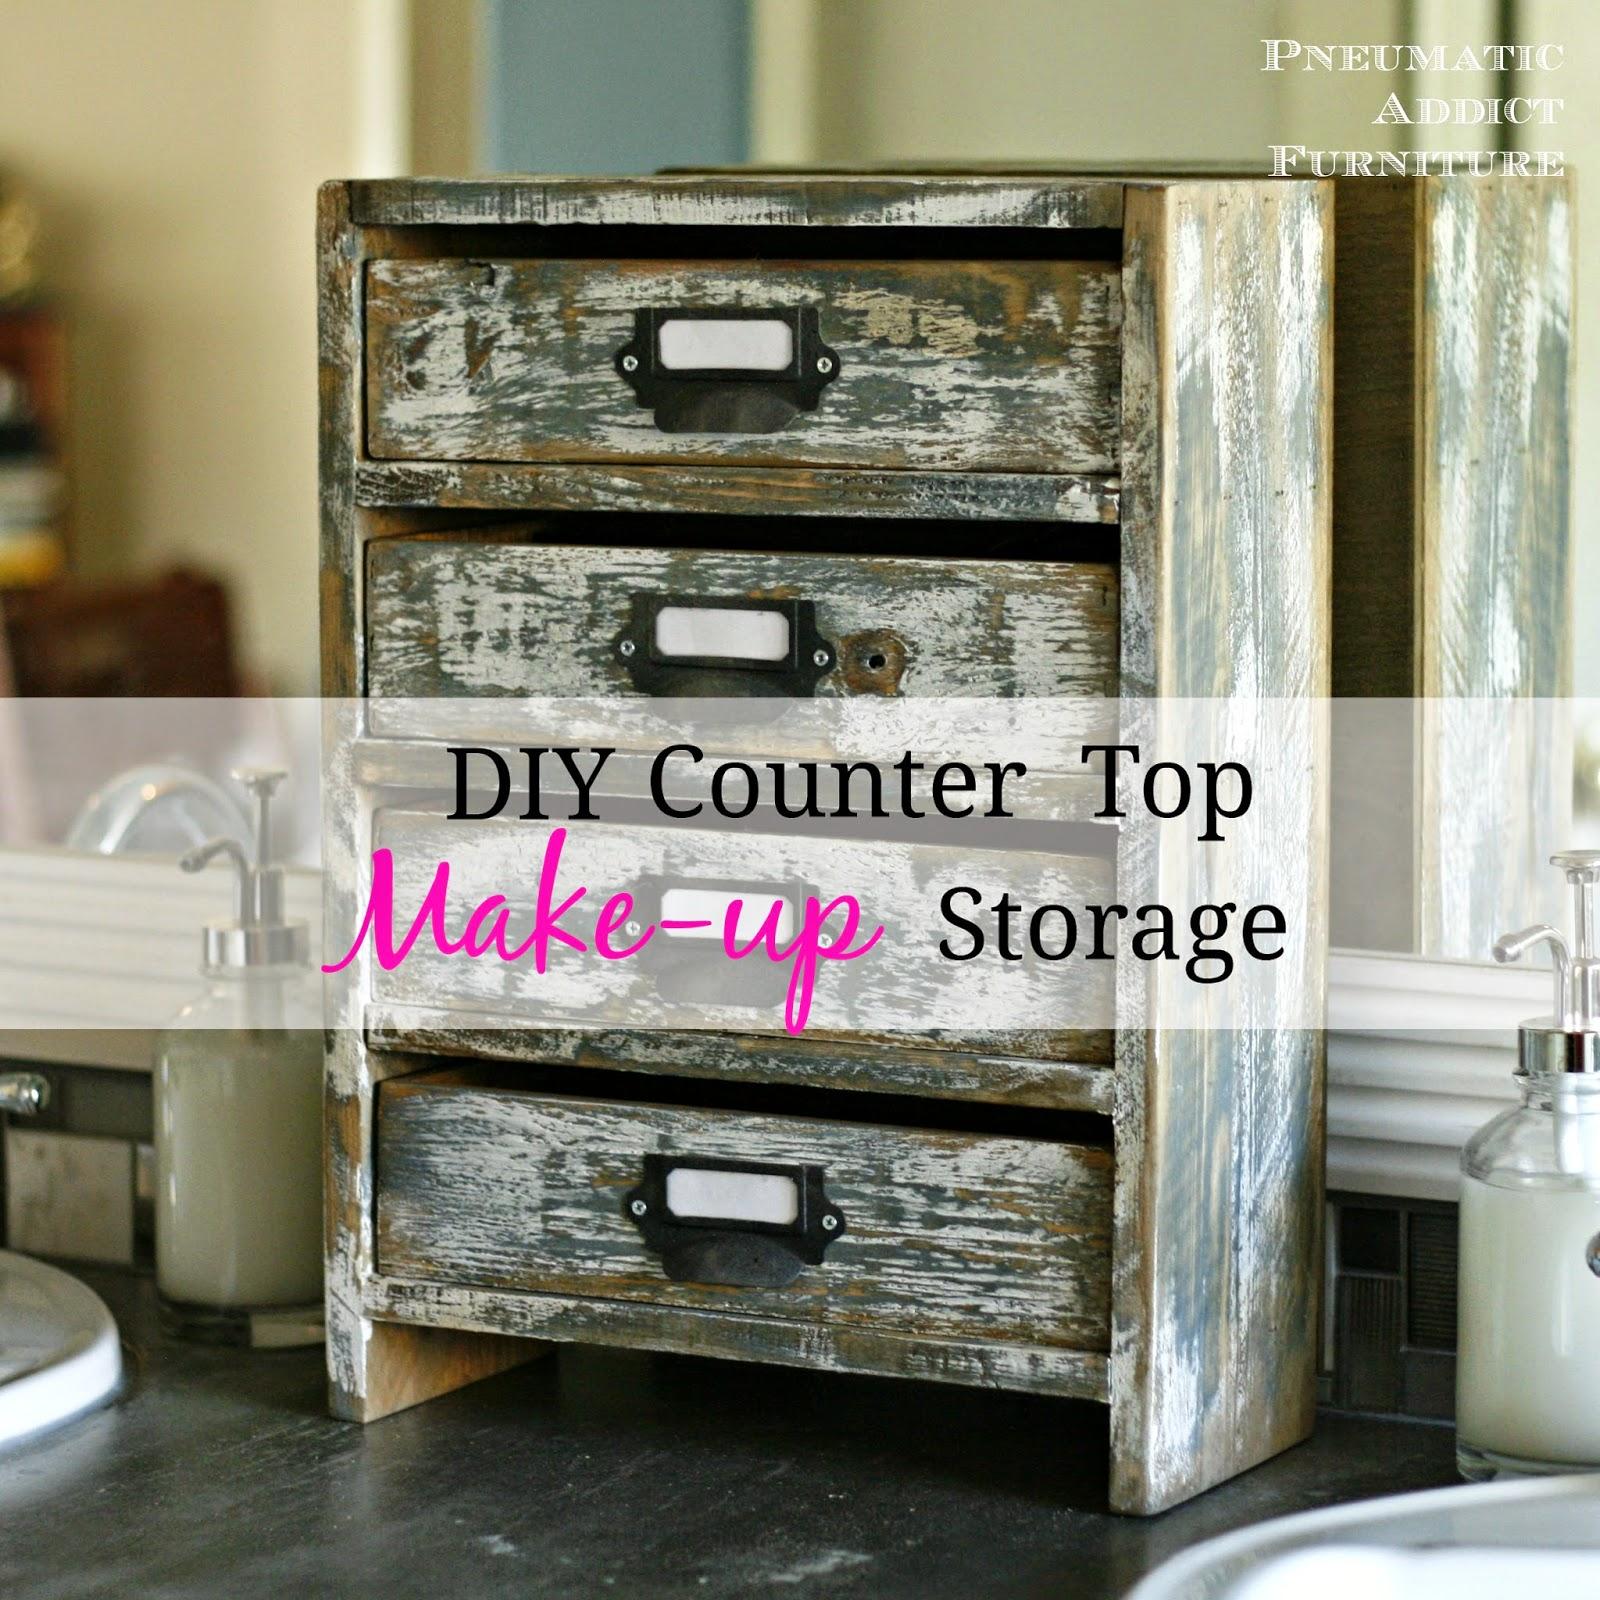 Diy Counter Top Make Up Storage